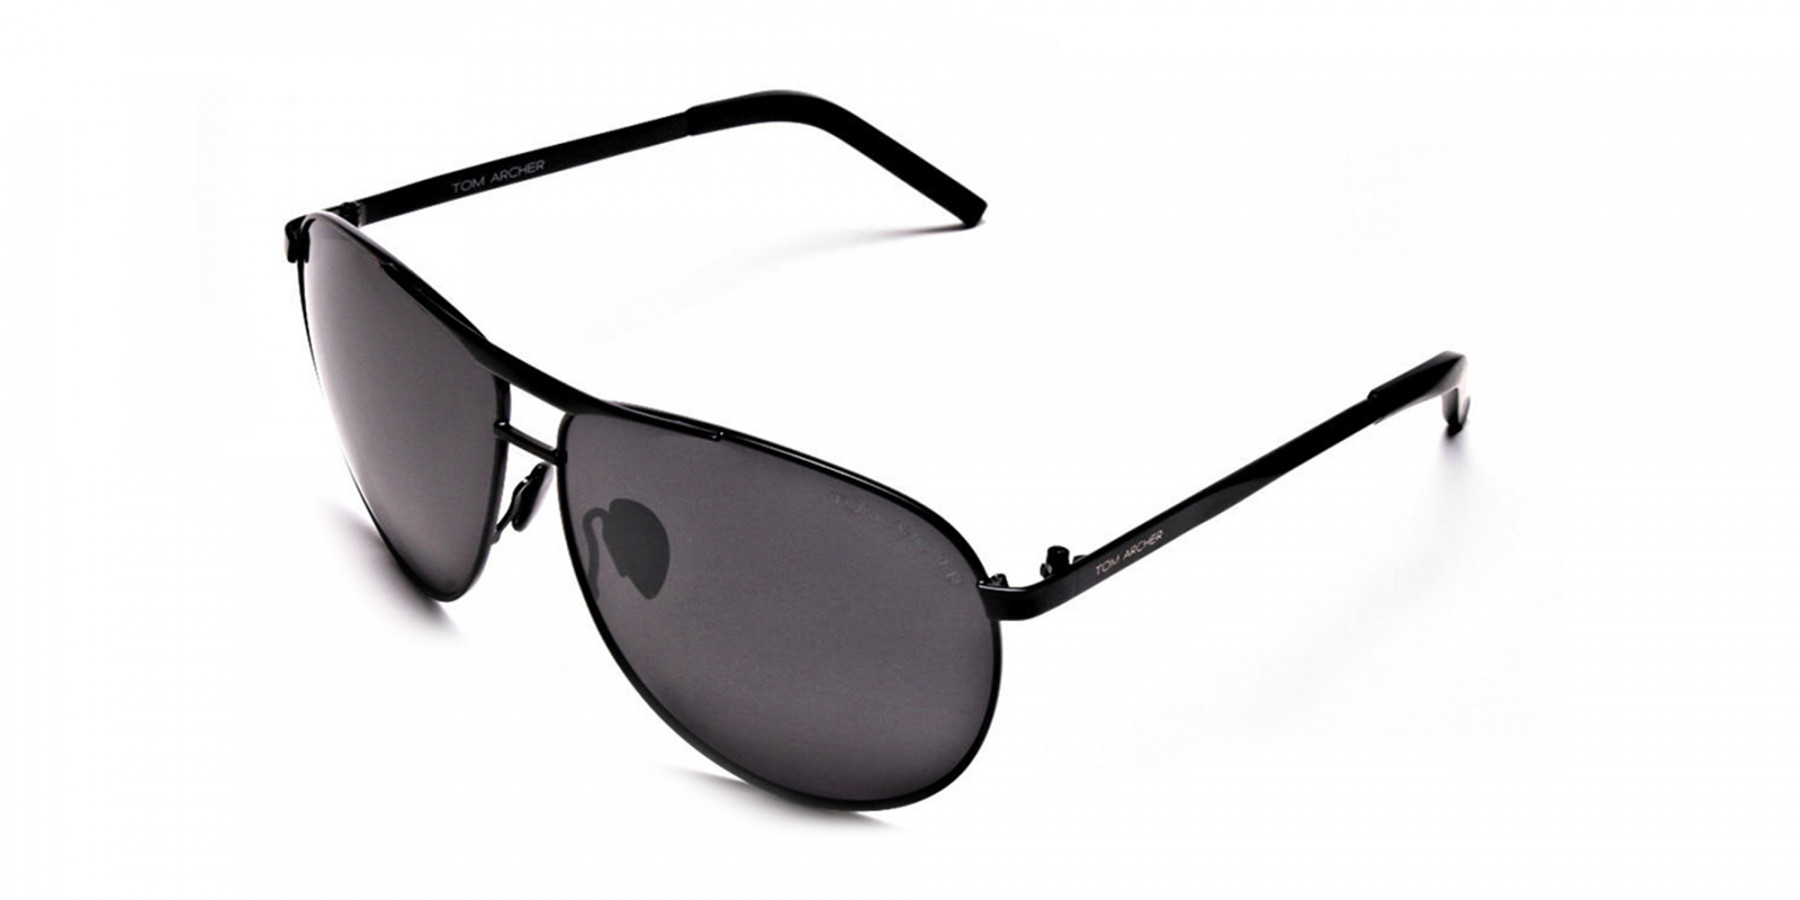 Luxurious Aviator Sunglasses in Black - 2